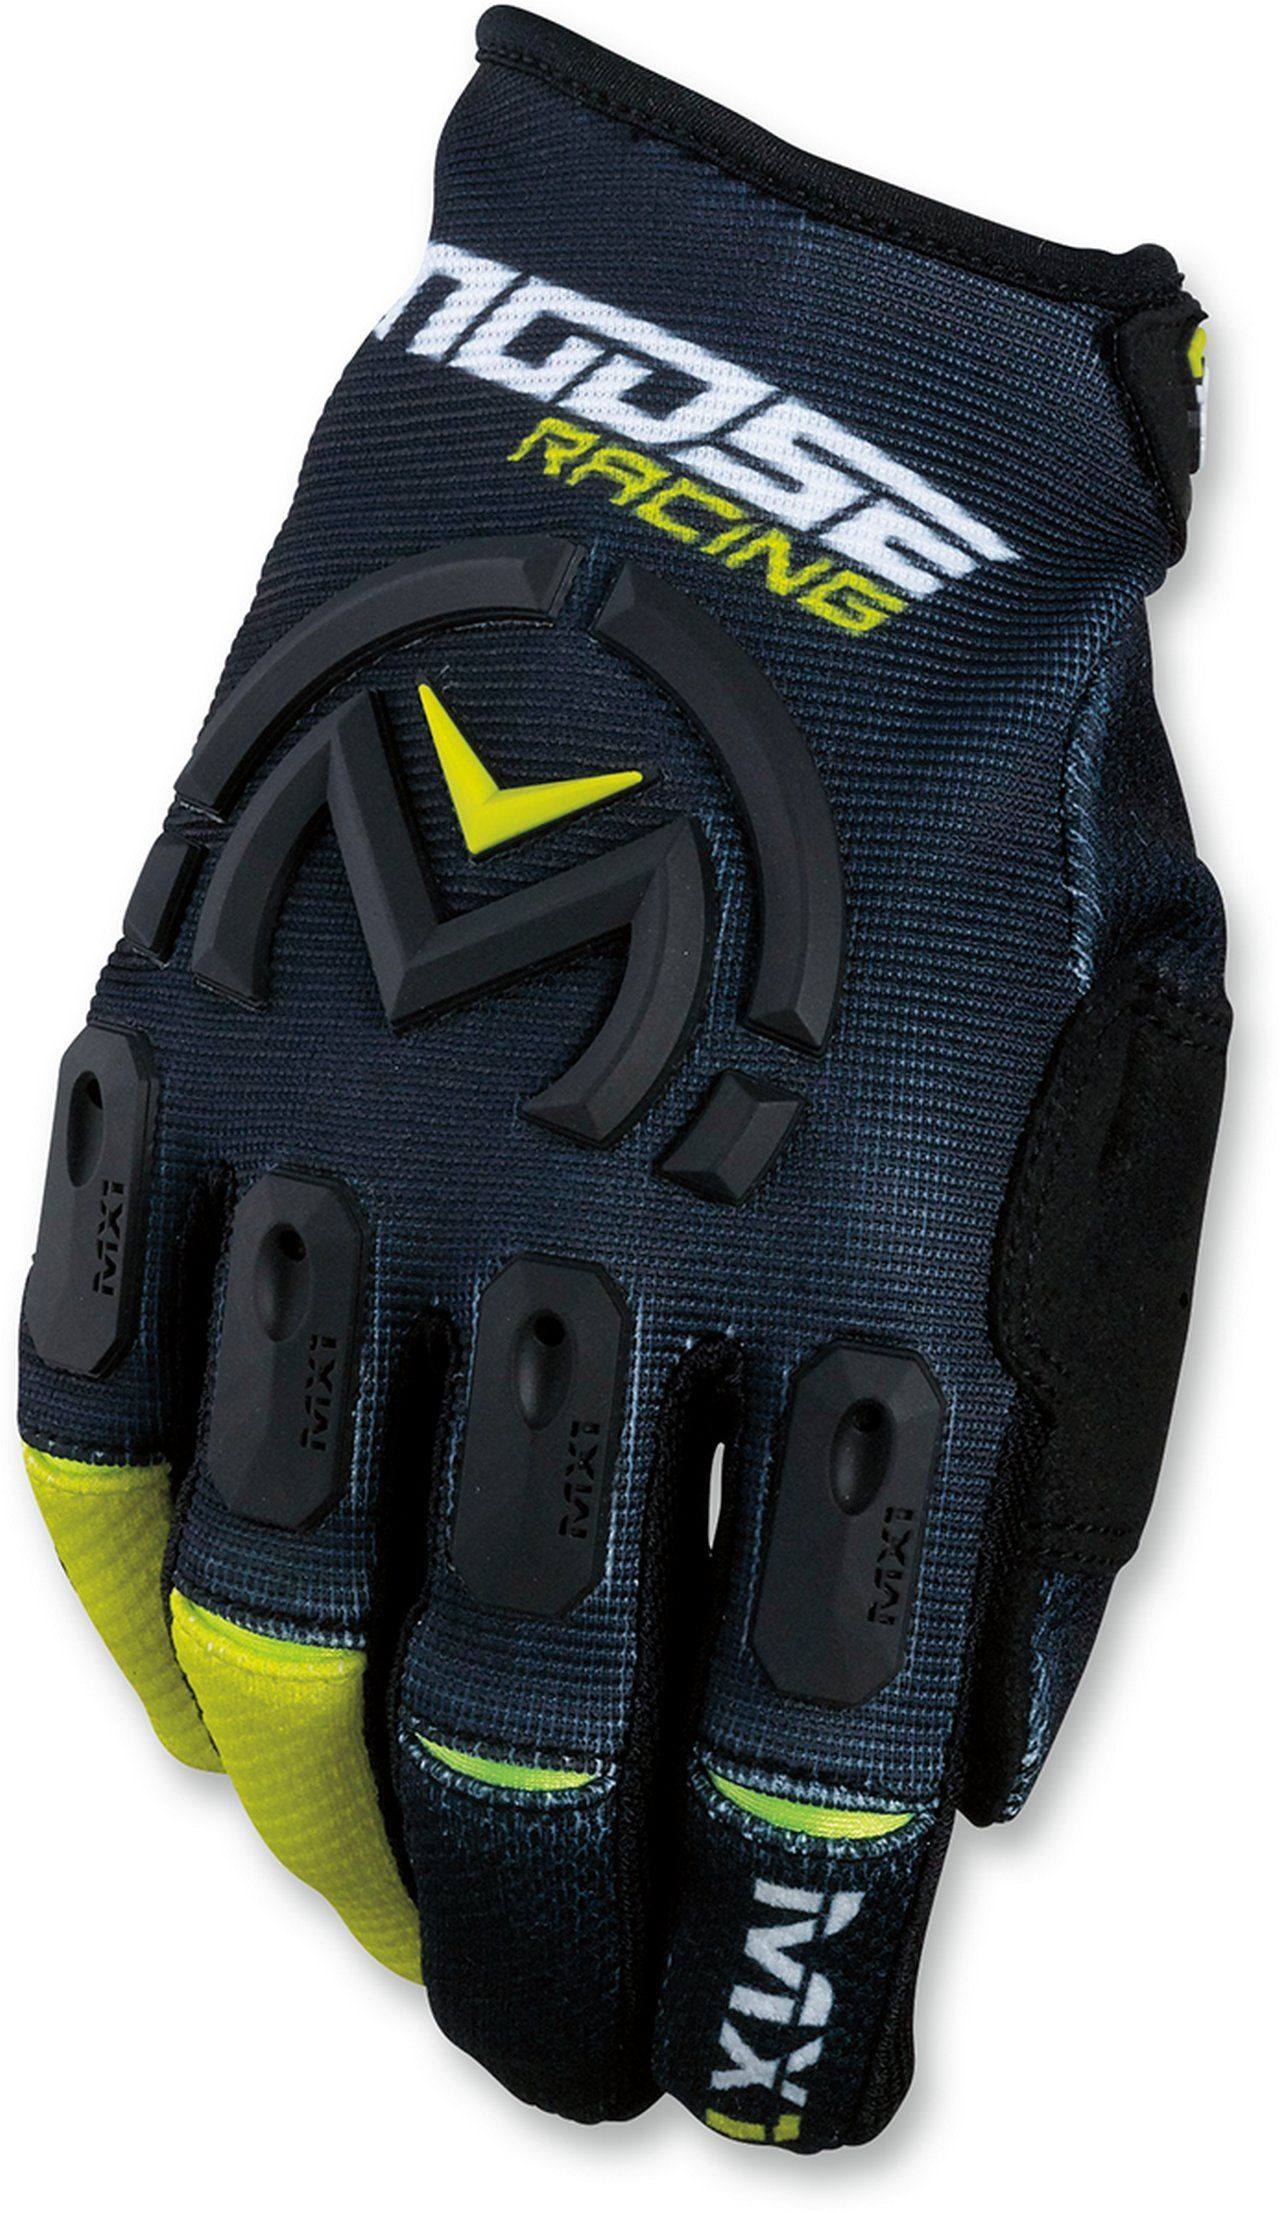 【MOOSE RACING】MX1 手套 [3330-4476] - 「Webike-摩托百貨」